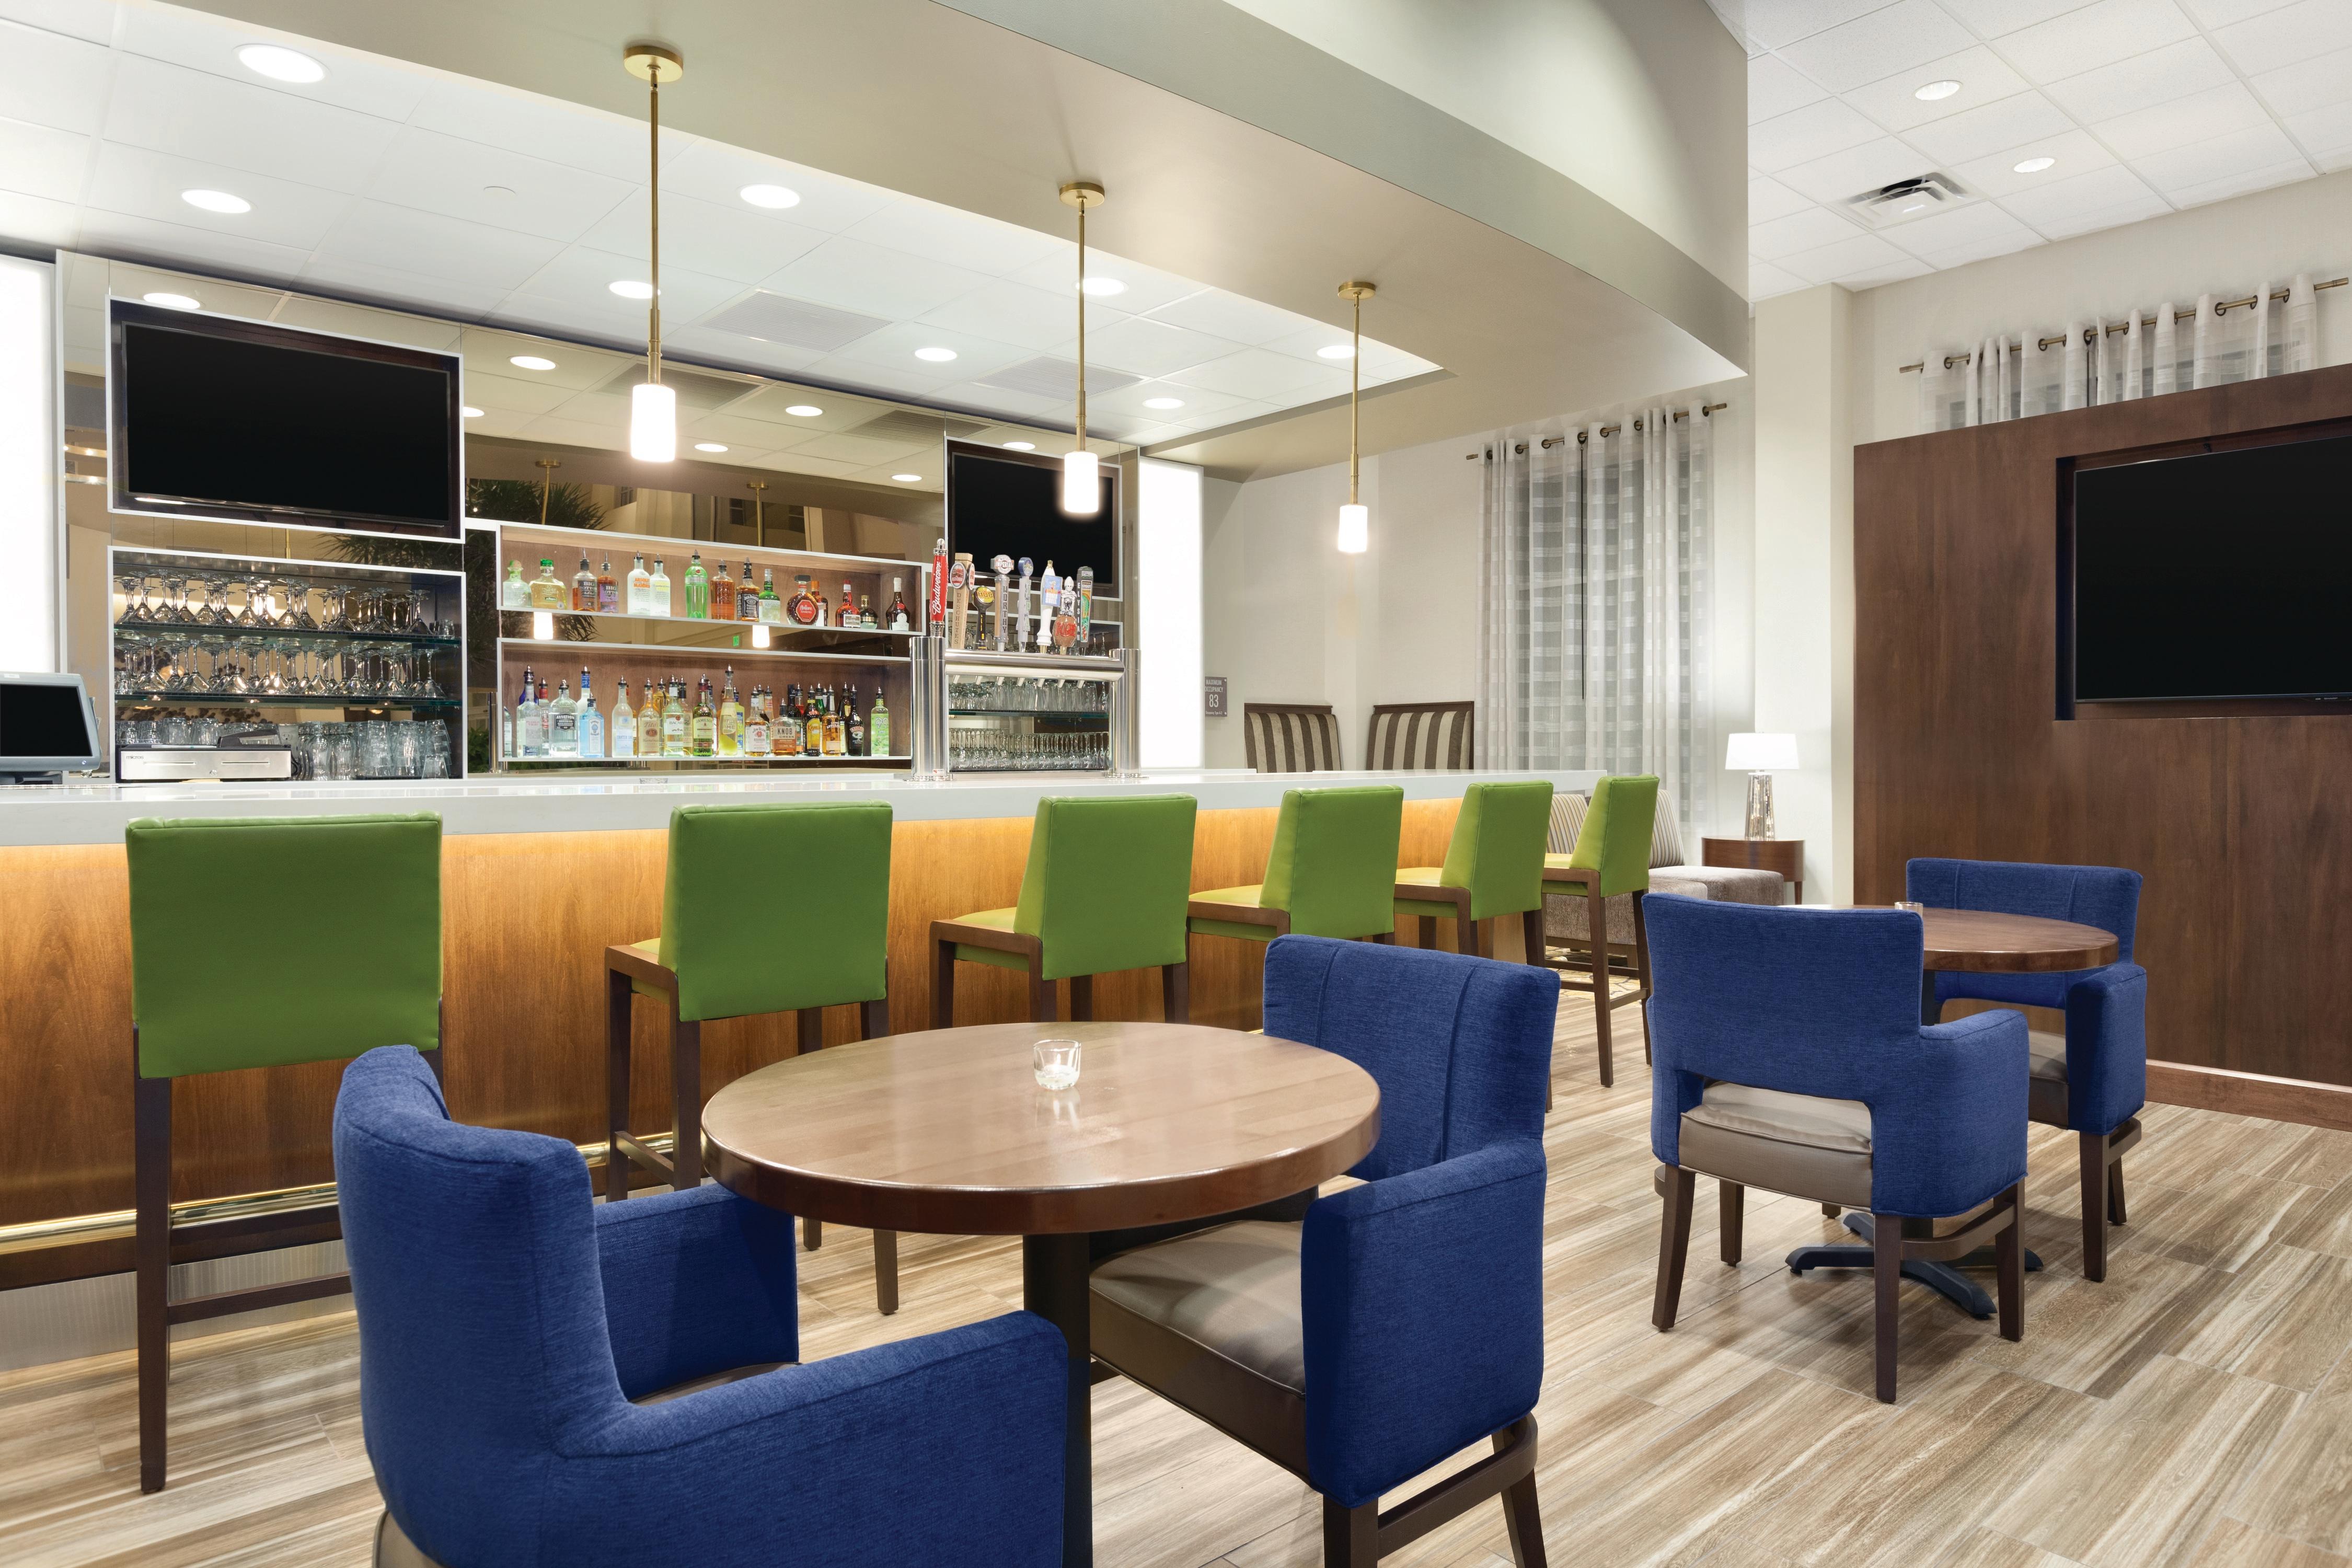 Embassy Suites by Hilton Portland Hillsboro, Oregon image 10